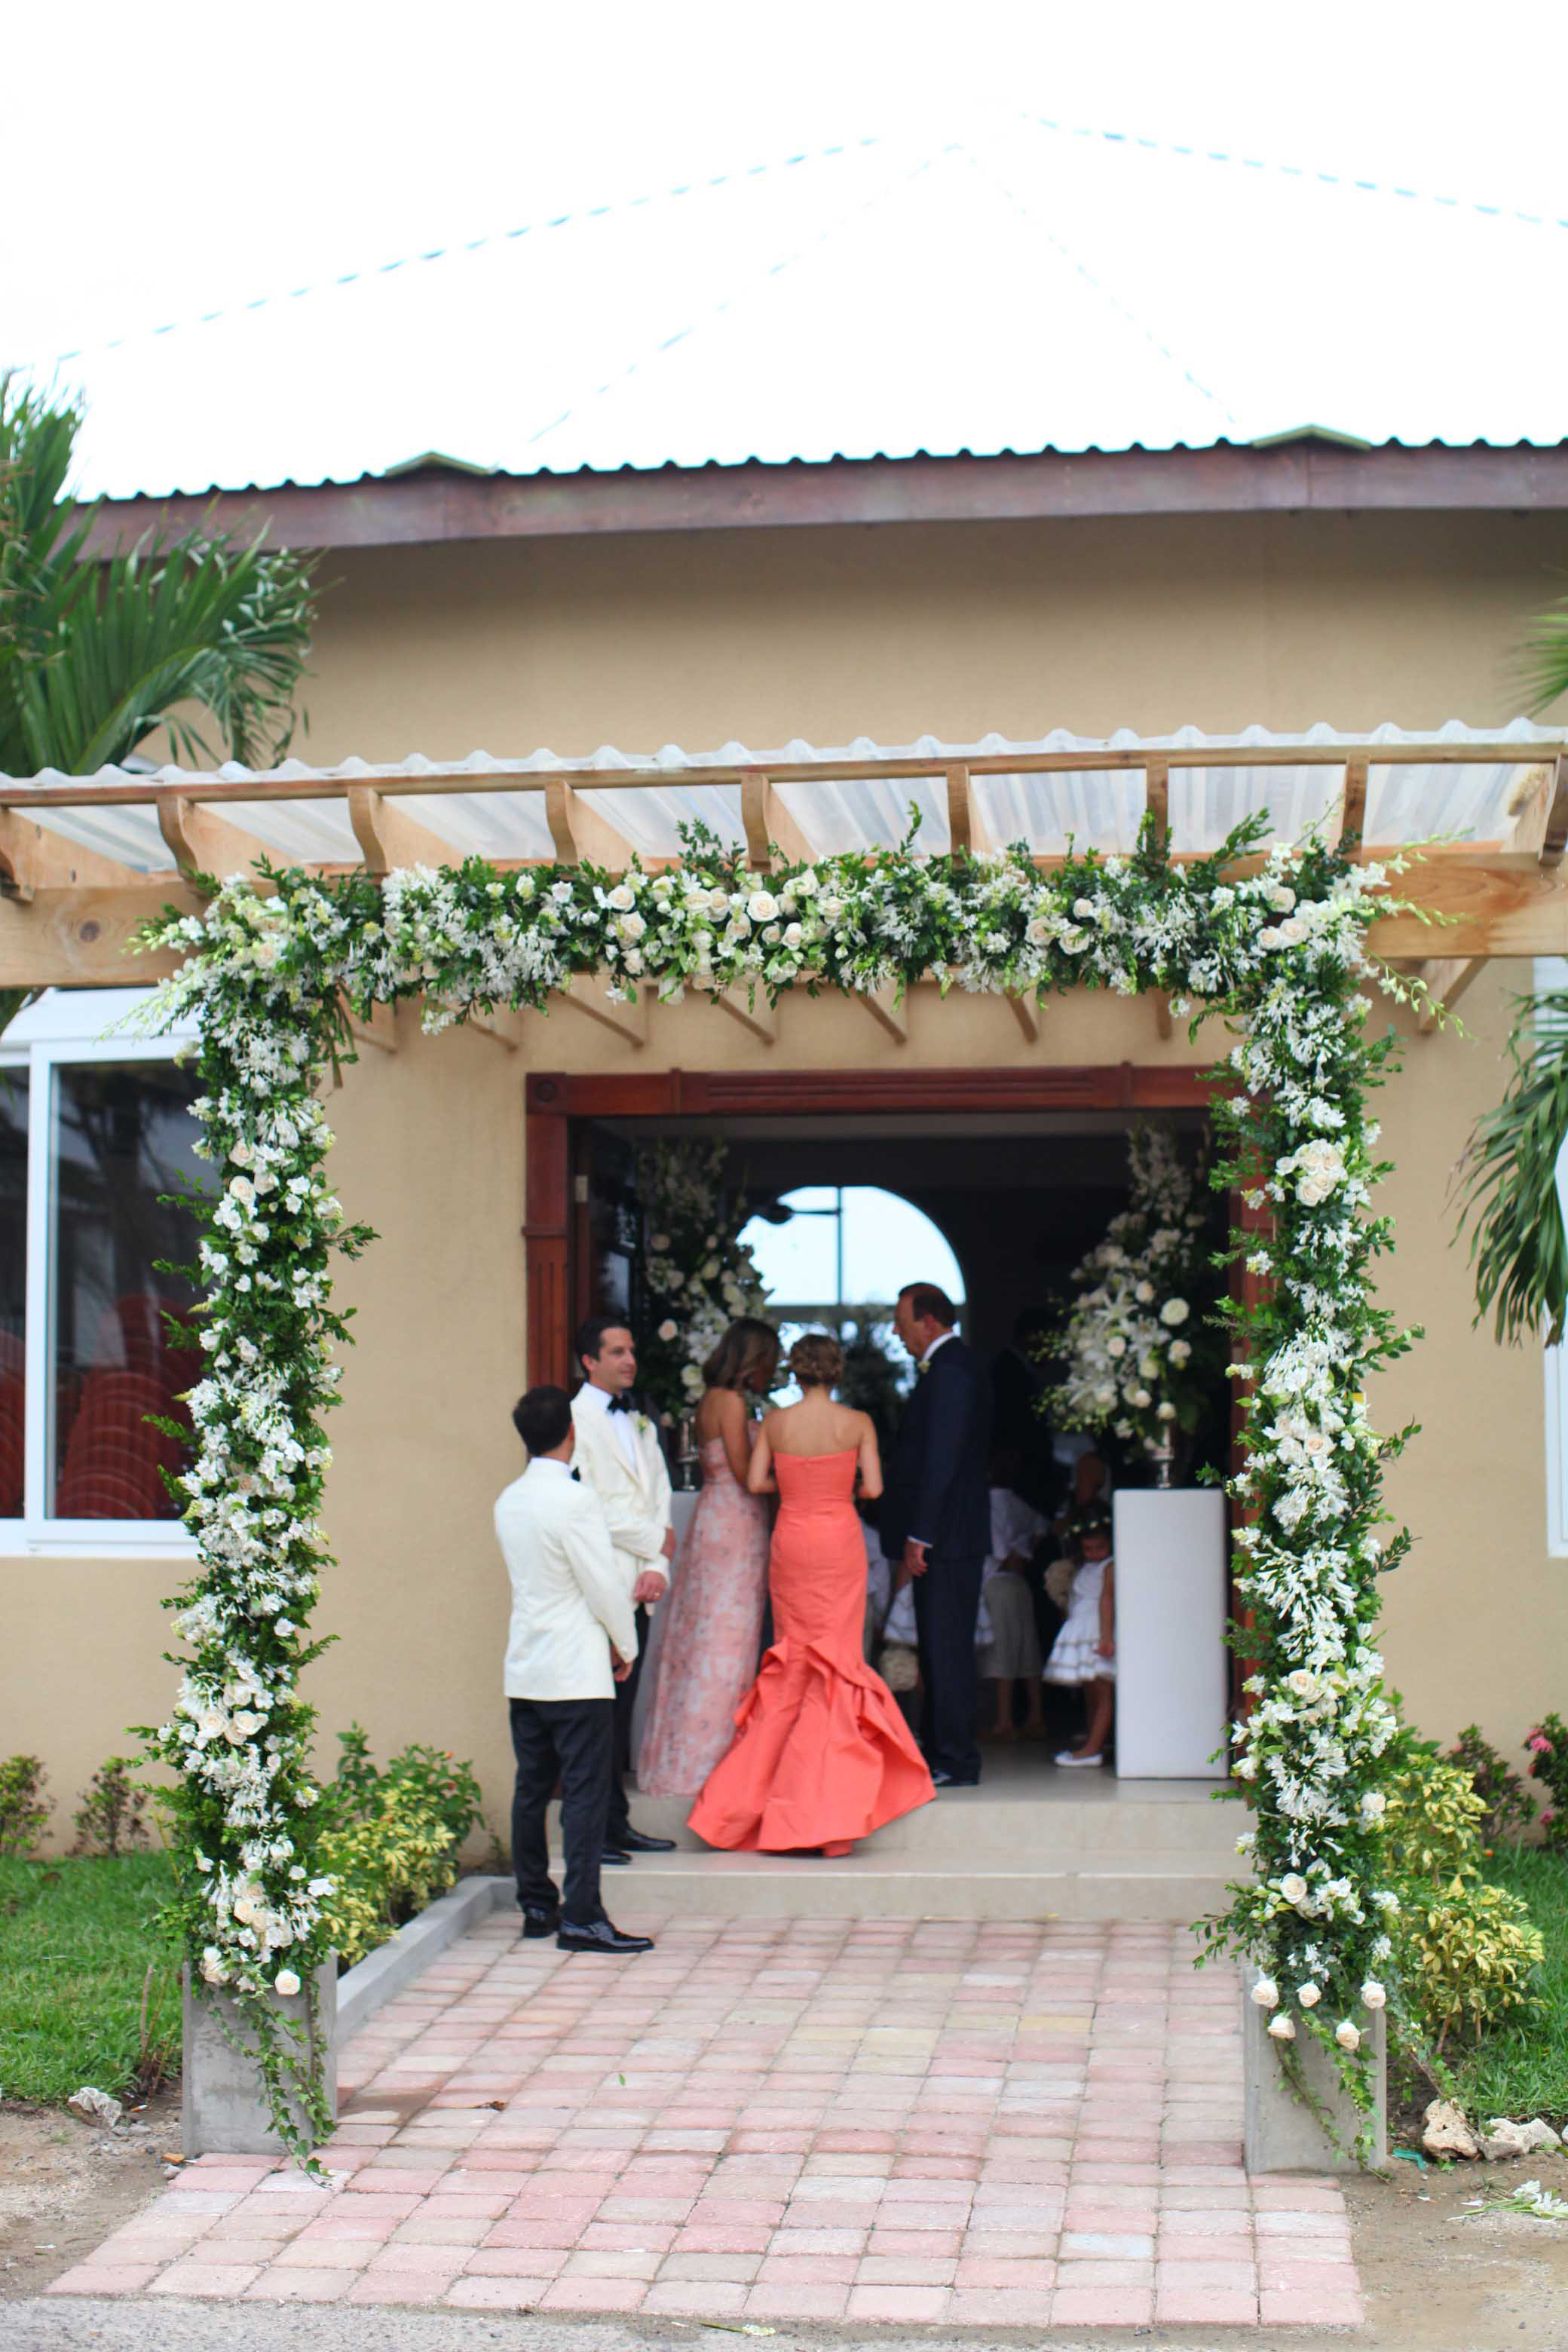 ensayo de boda